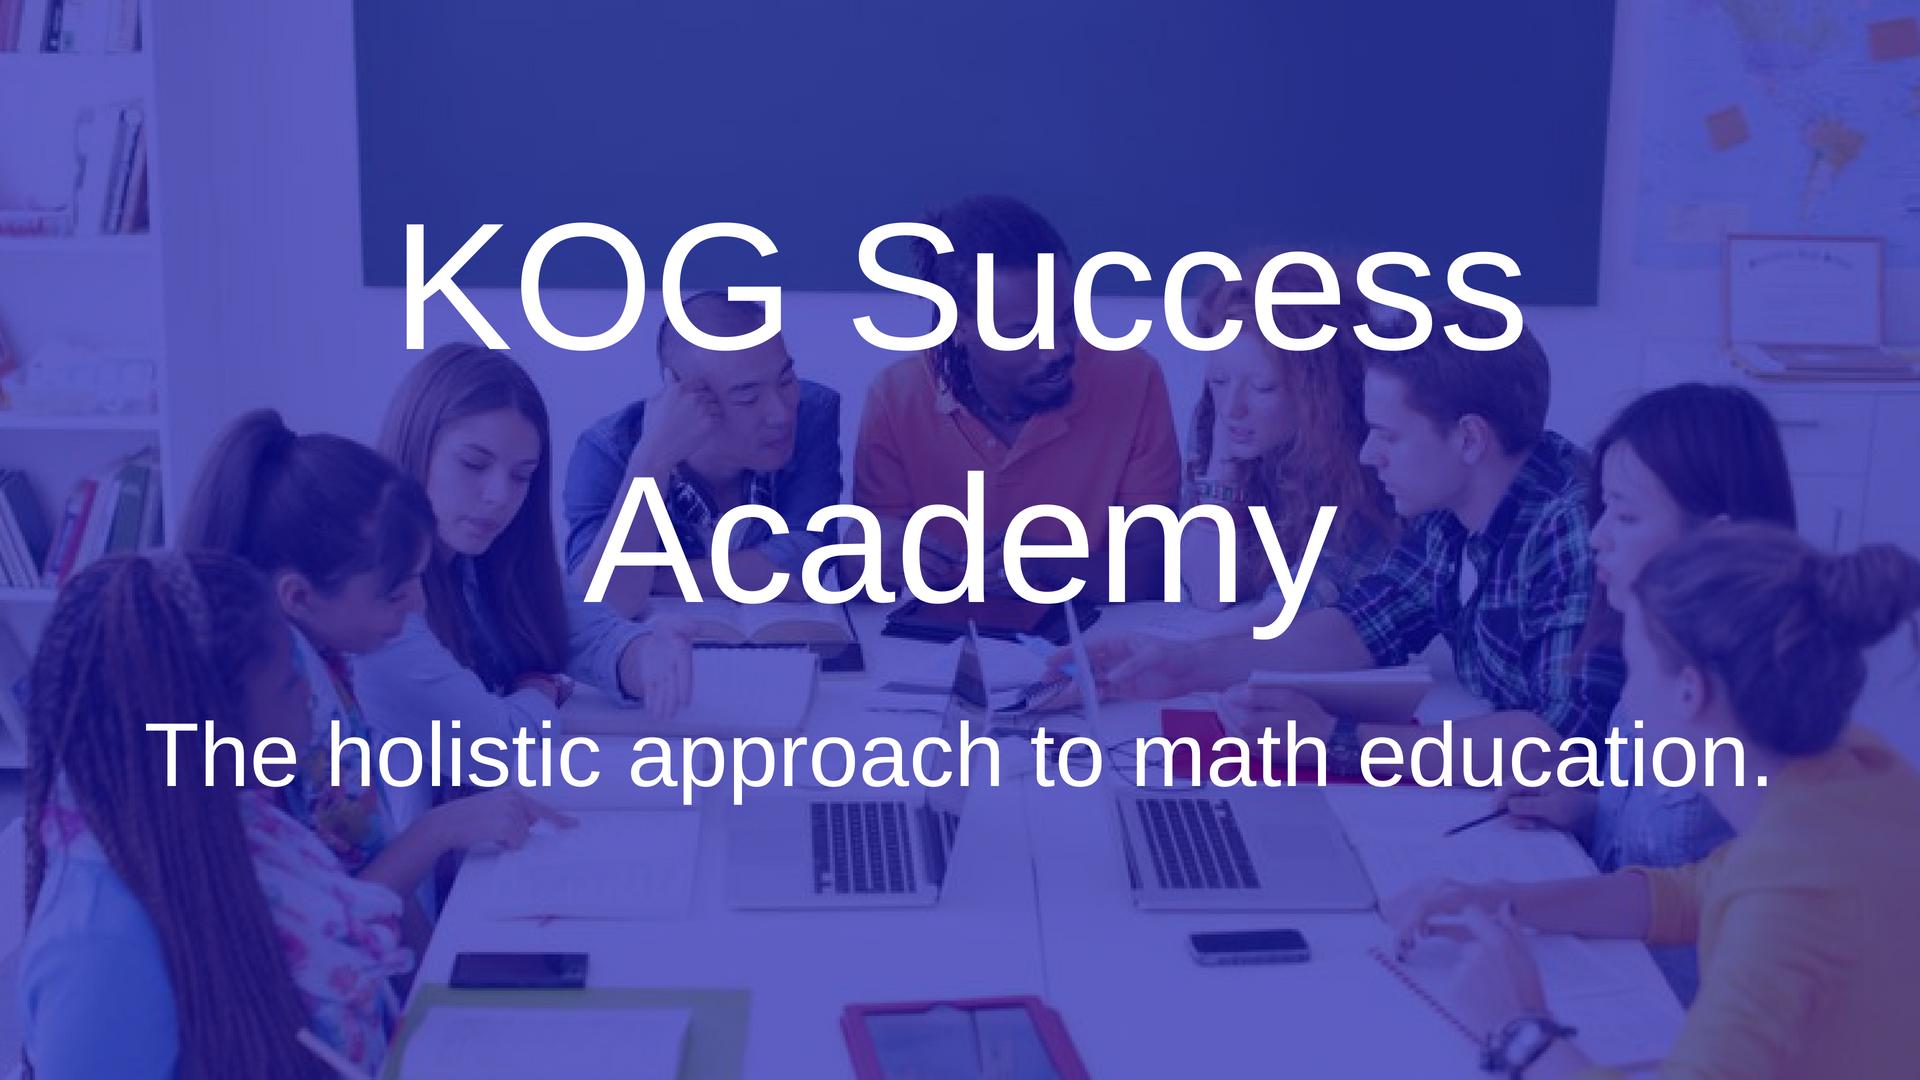 kog-success-academy_page-banner_knowledgeovergrades.net.png